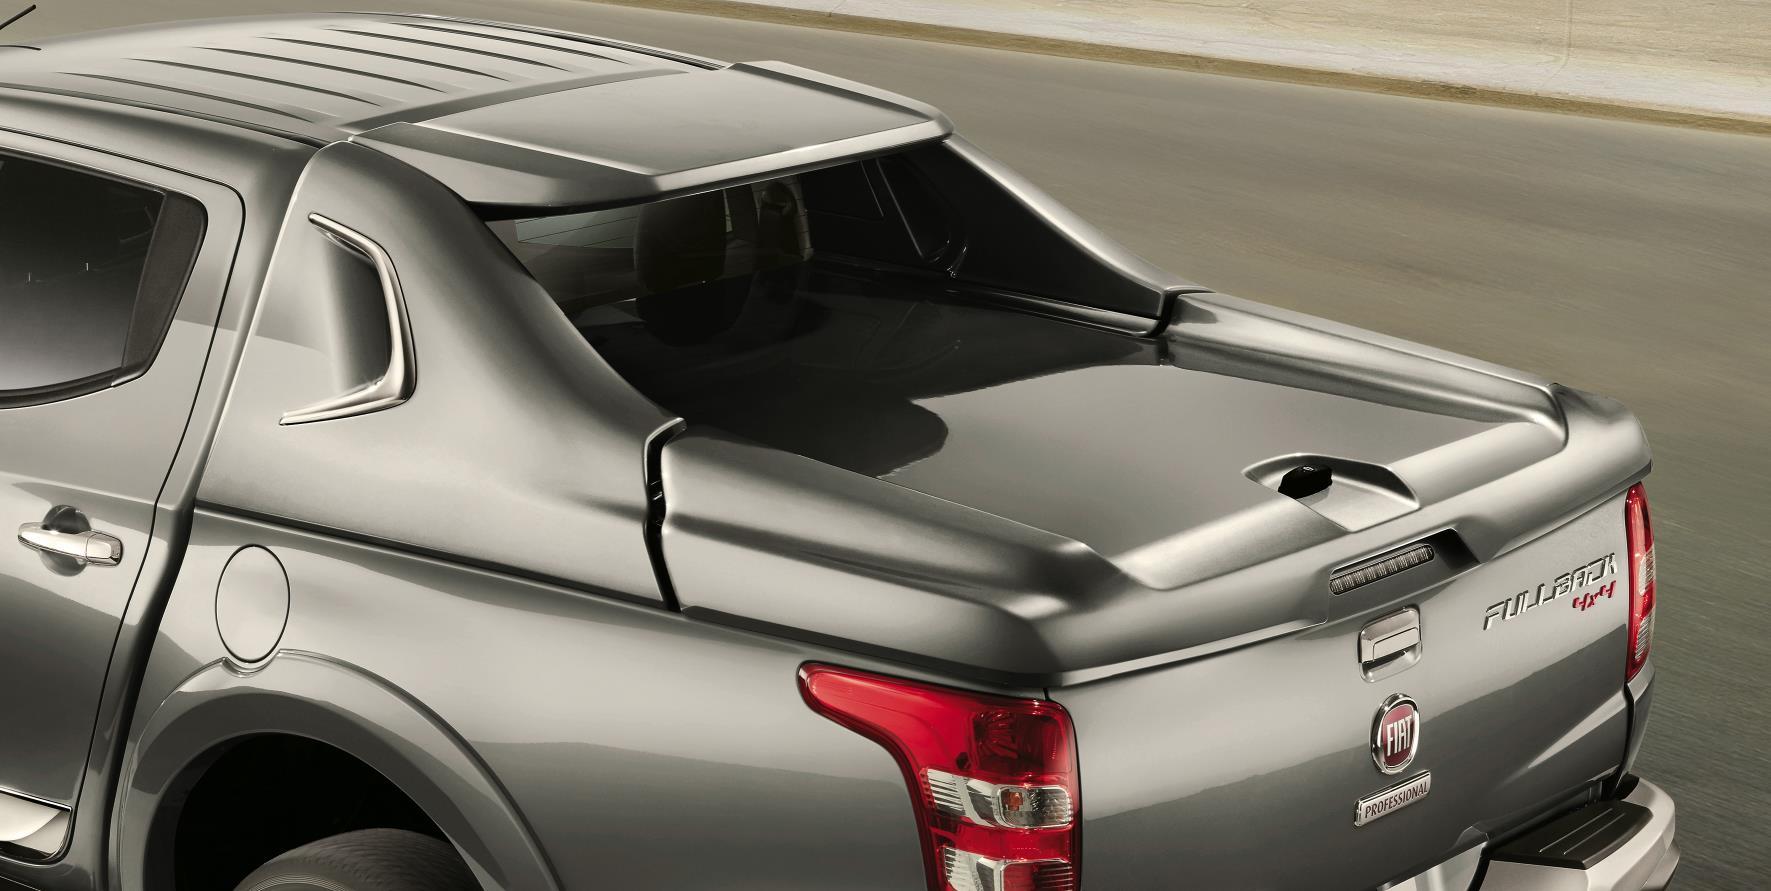 2016 Fiat Fullback Priced at £20,995 (ex. VAT) in the ...